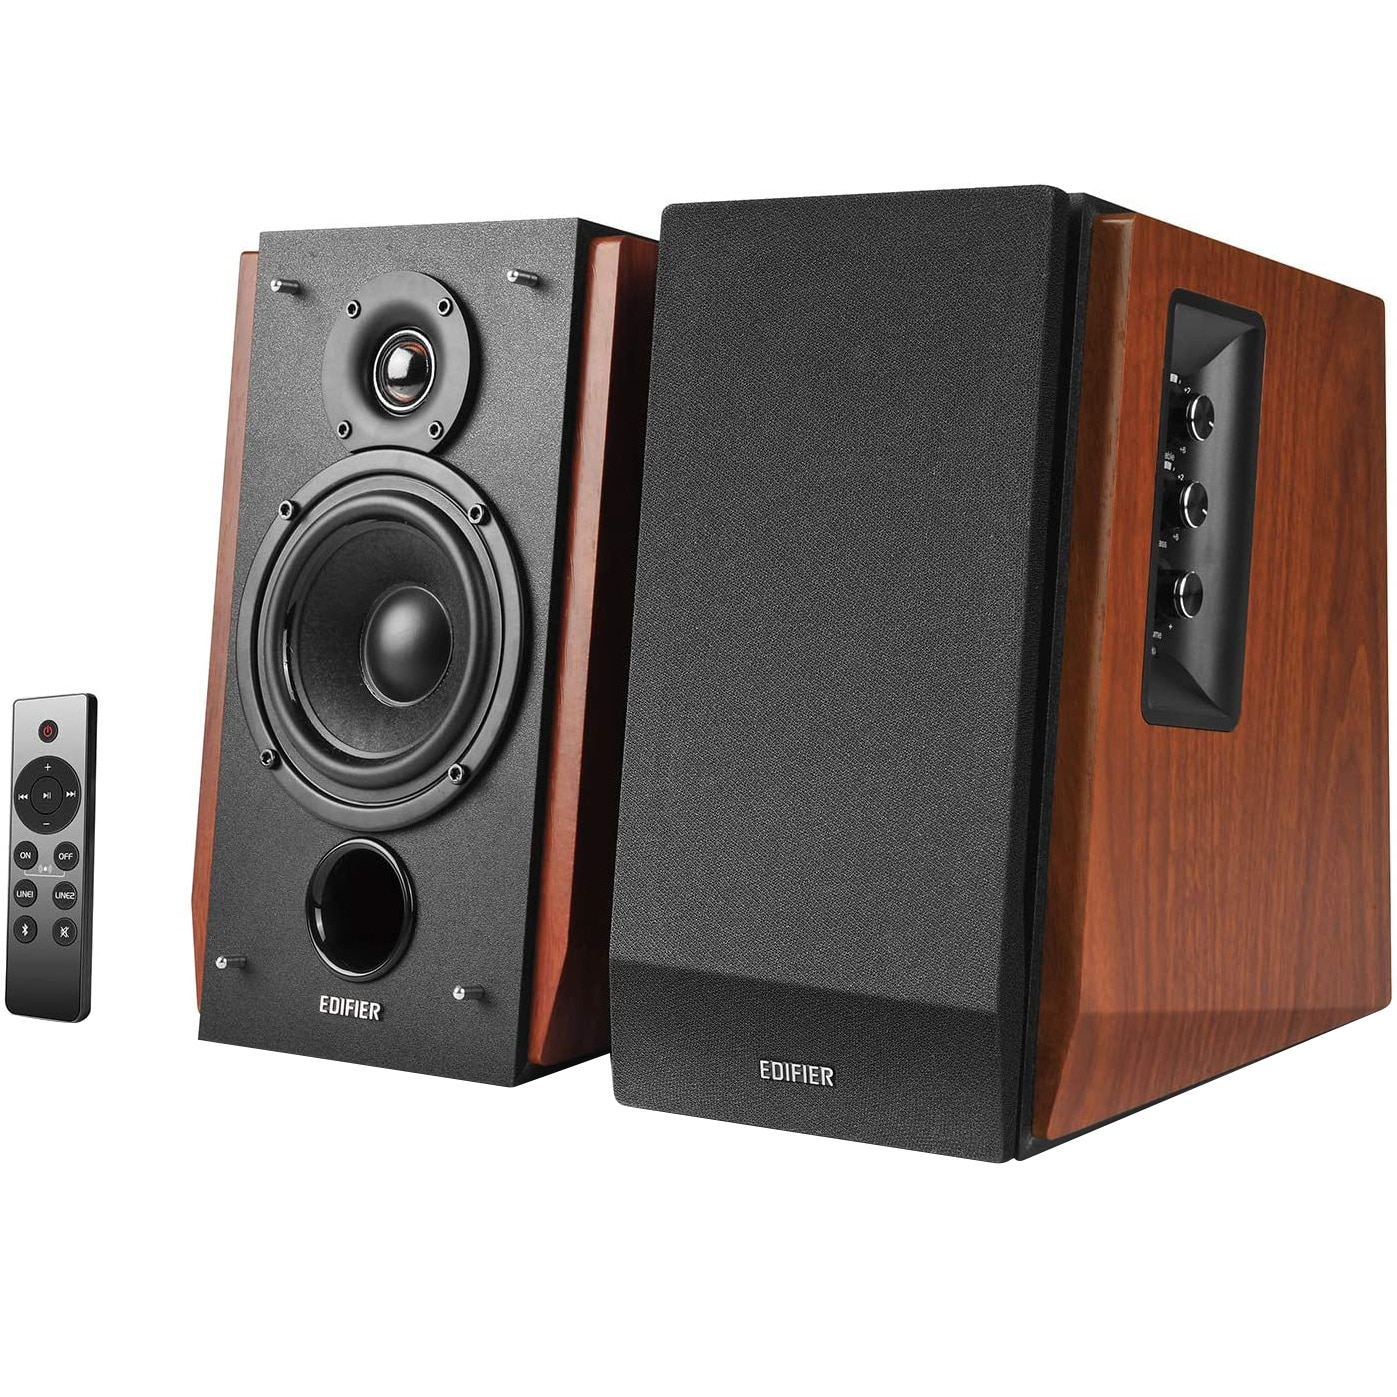 Fotografie Boxe Edifier R1700BTS, 2.0, 66W, Bluetooth, Telecomanda, sub-out, Brown